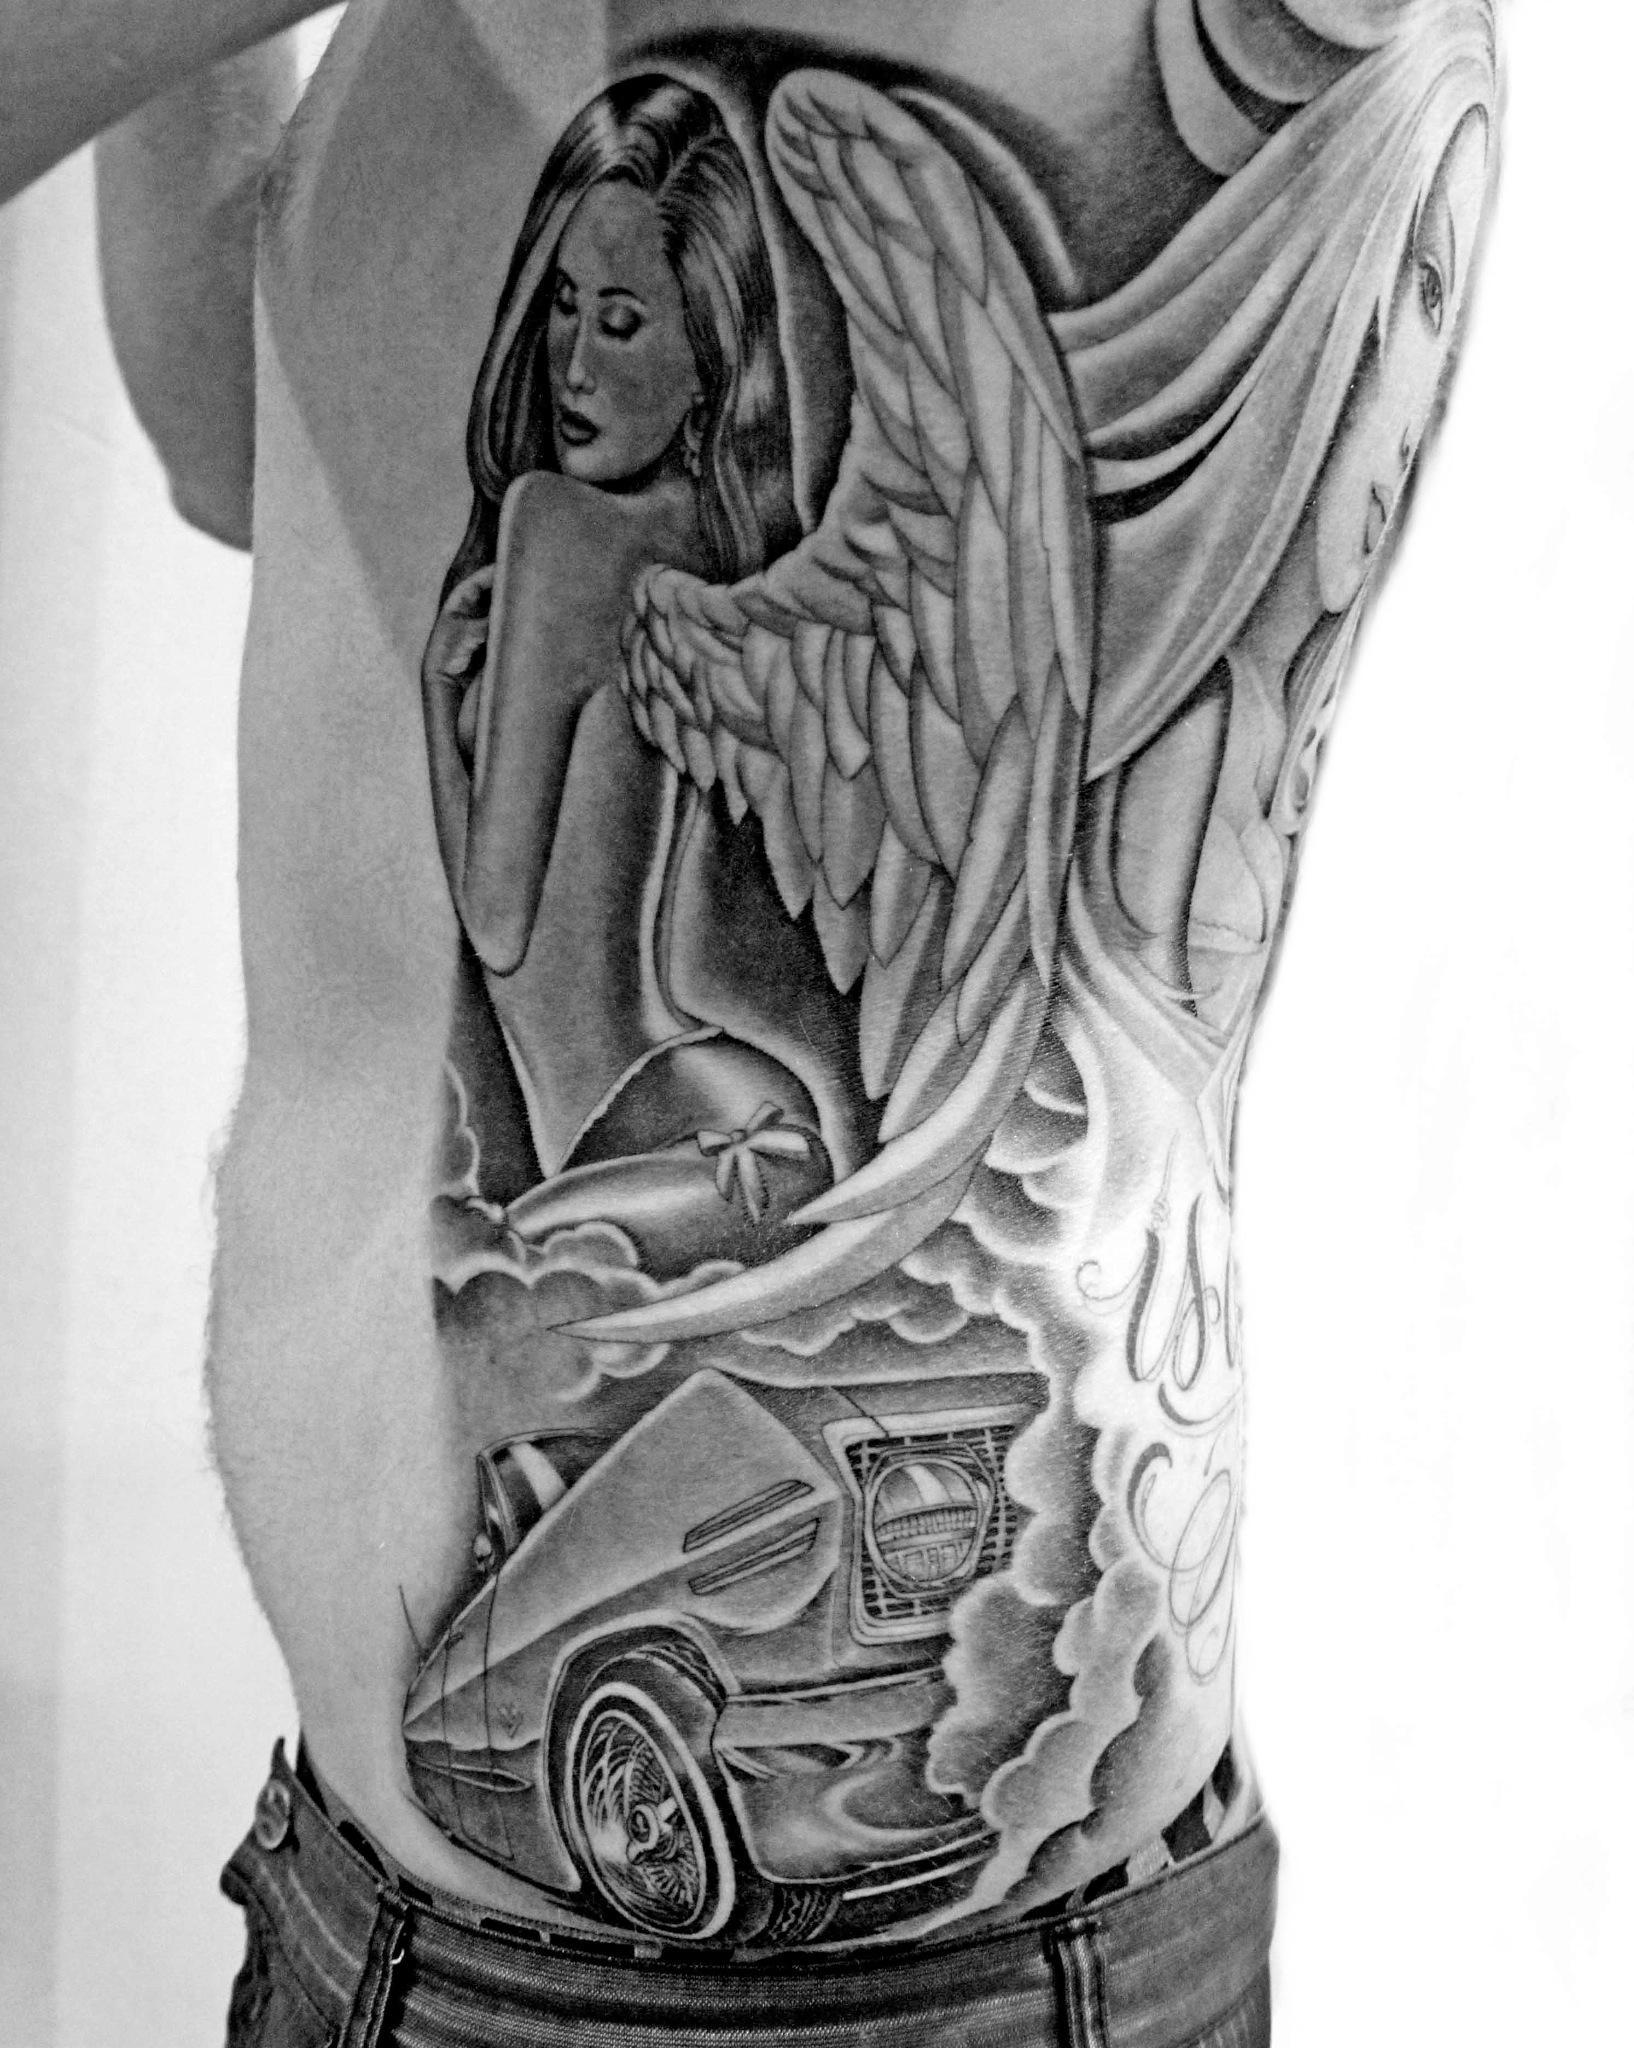 #angel #ribs #blackandgrey #mistercartoon #skidrowtattoo http://t.co/cZuPuVUrho